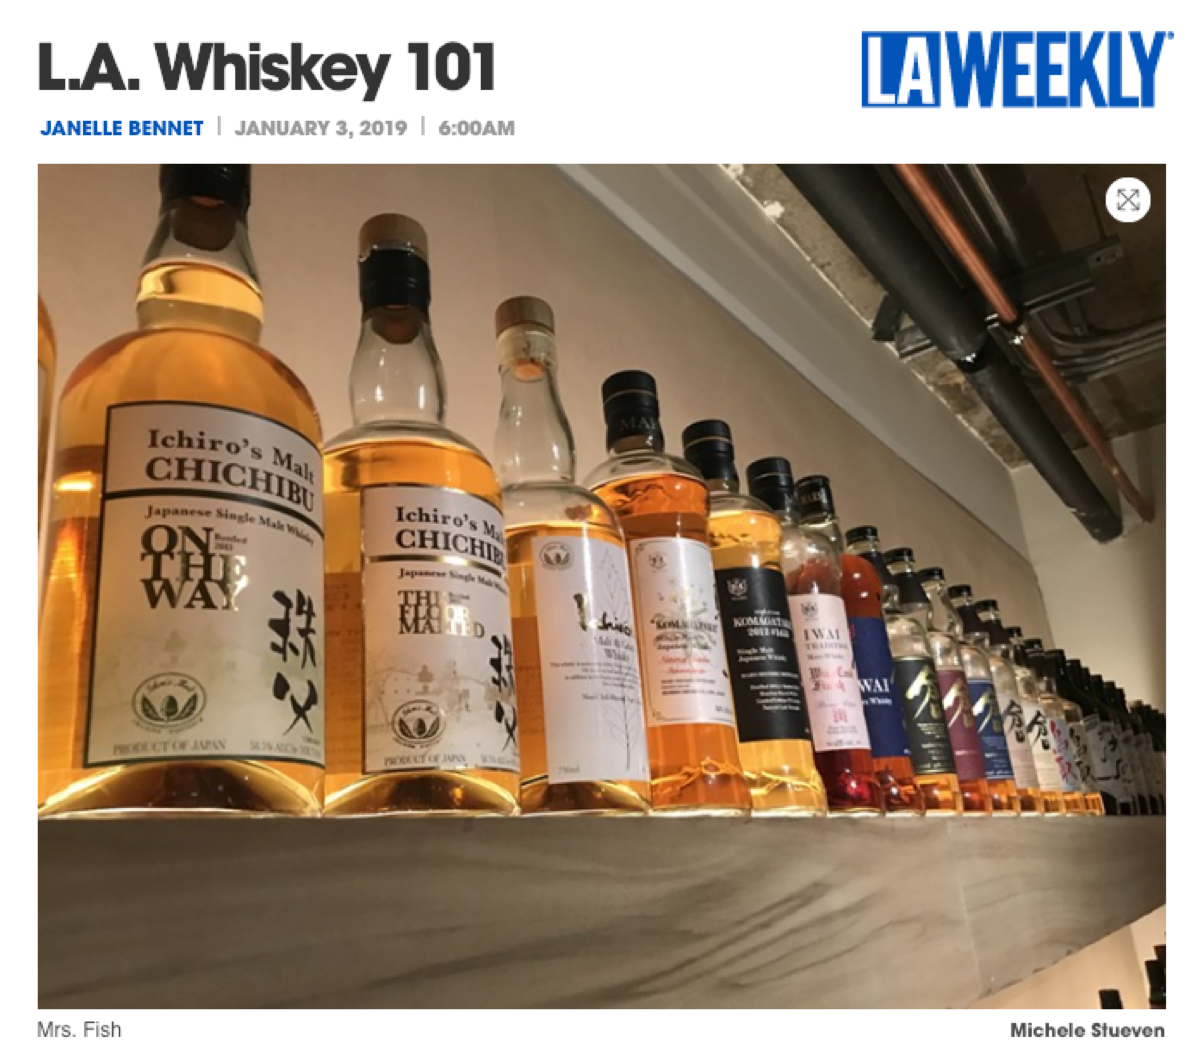 LA WHISKY 101 LA-Weekly 1-3-19.png